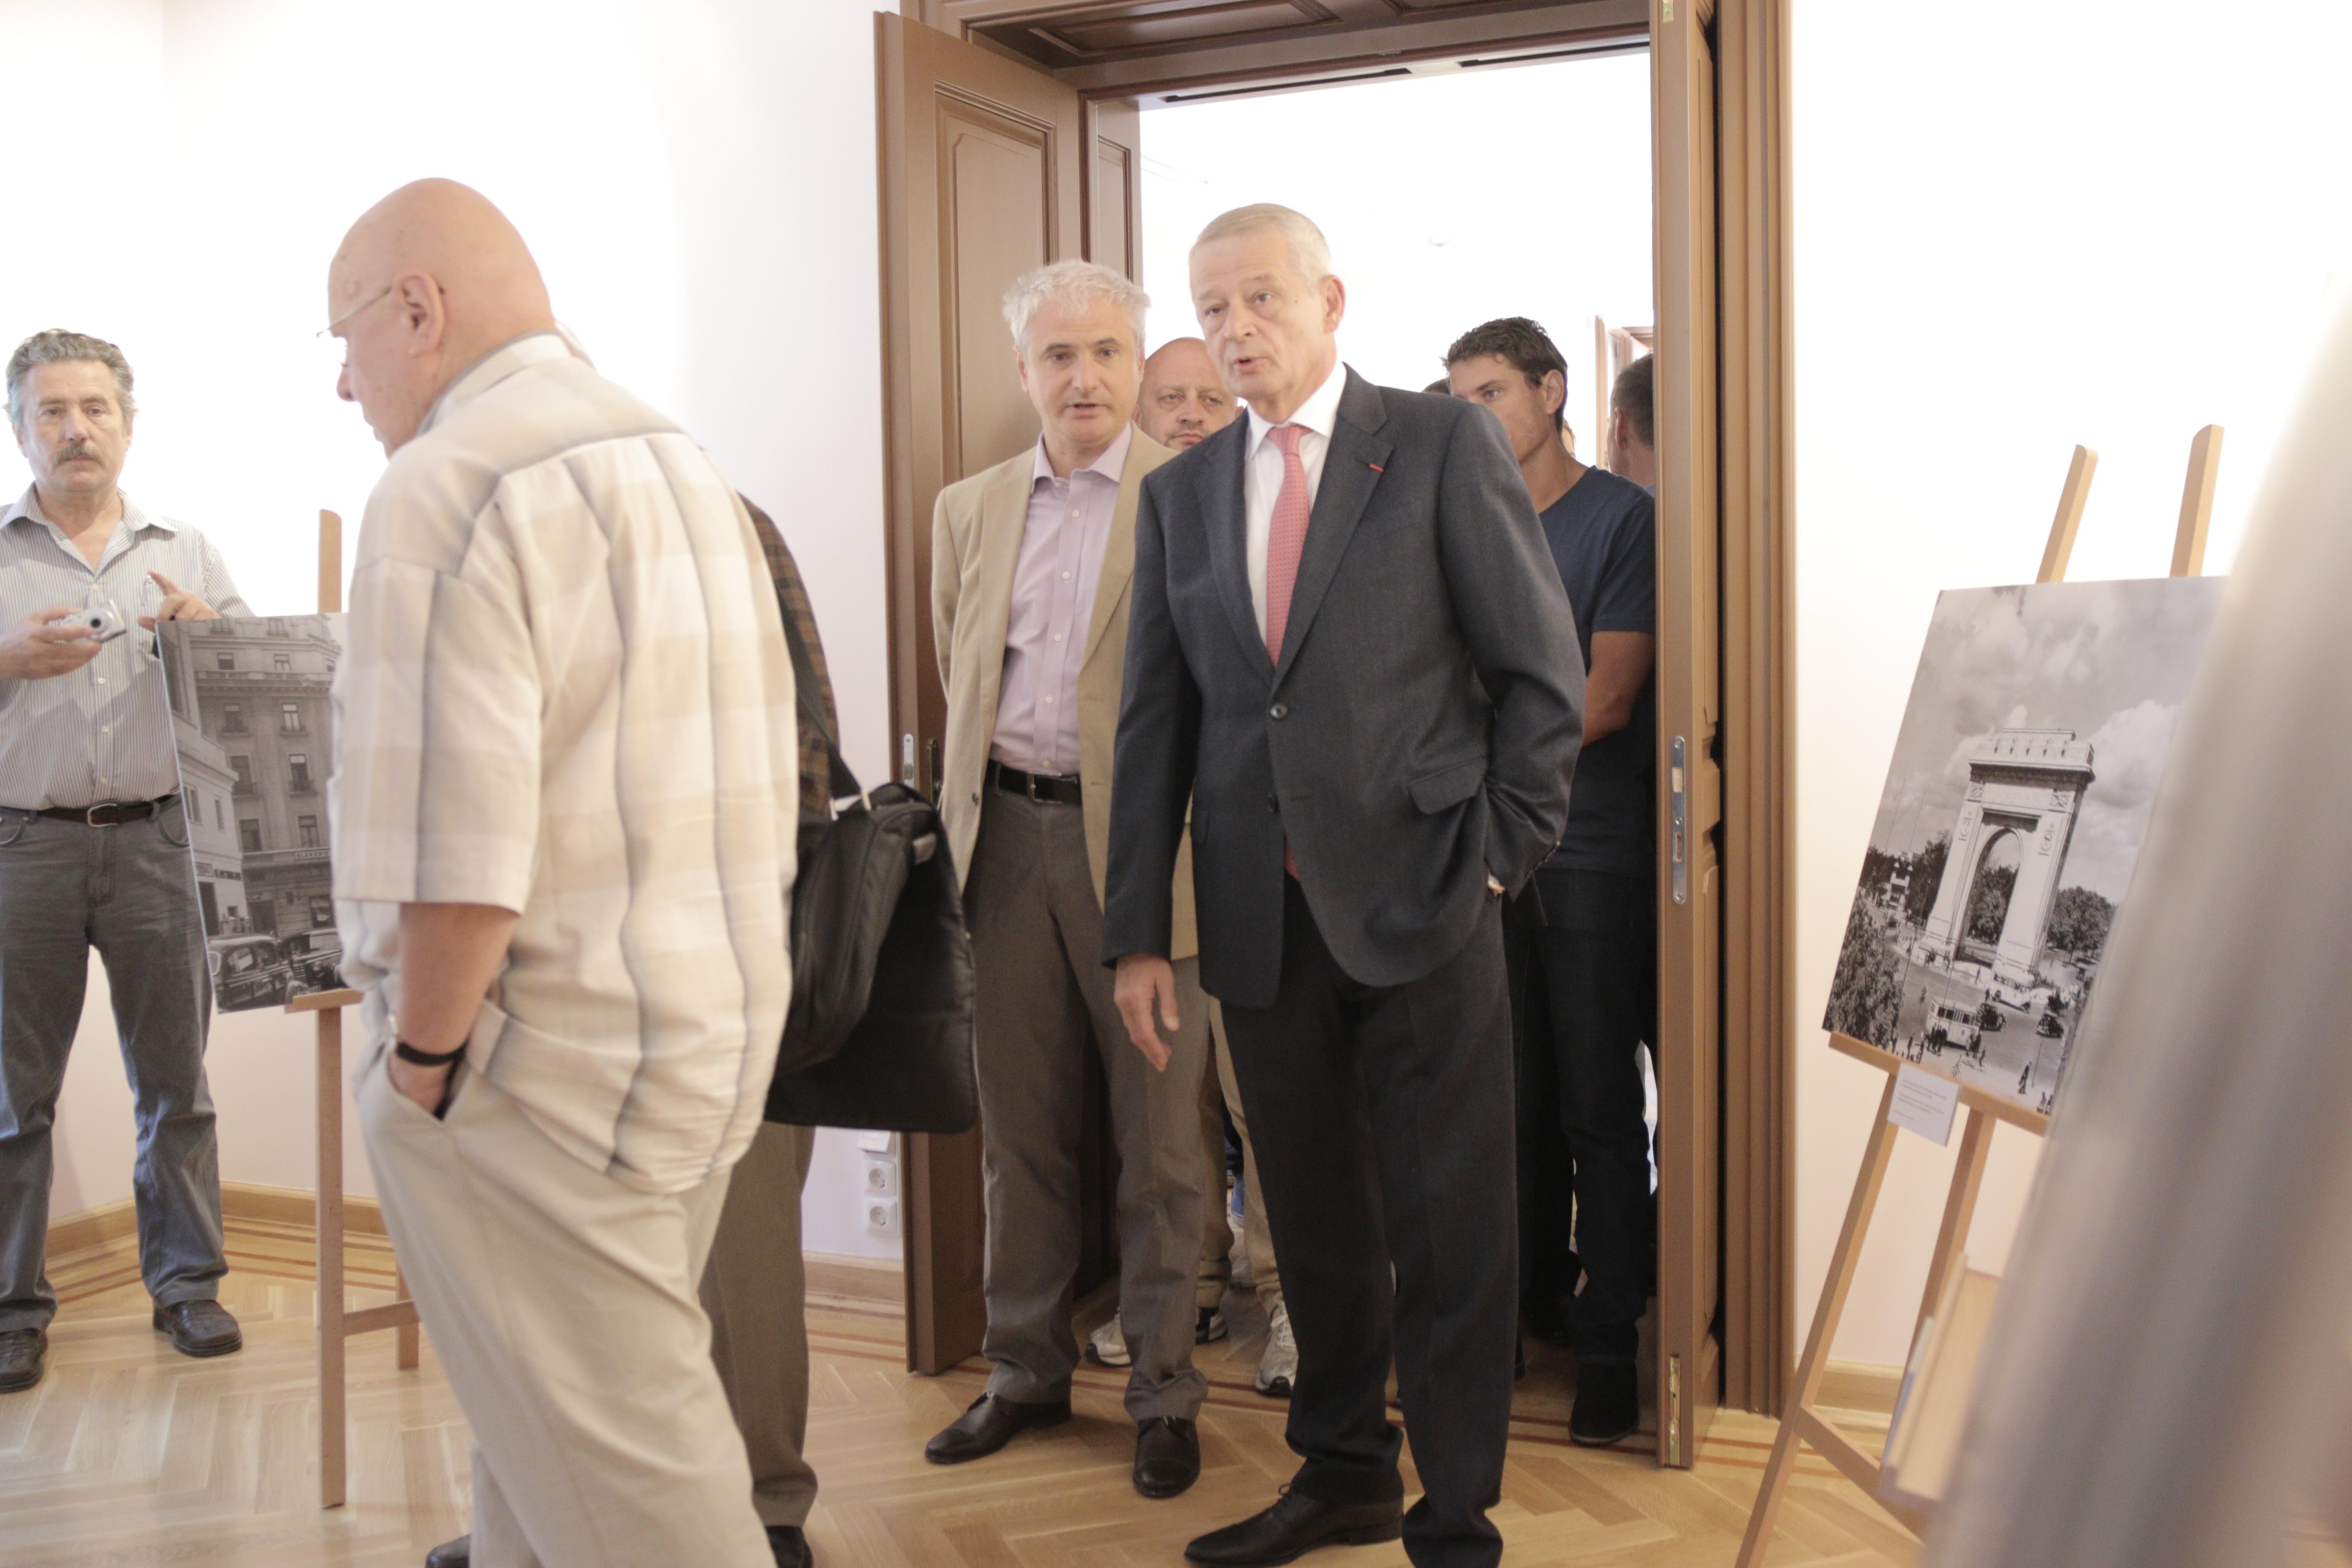 Muzeul gazduieste deja prima sa expozitie